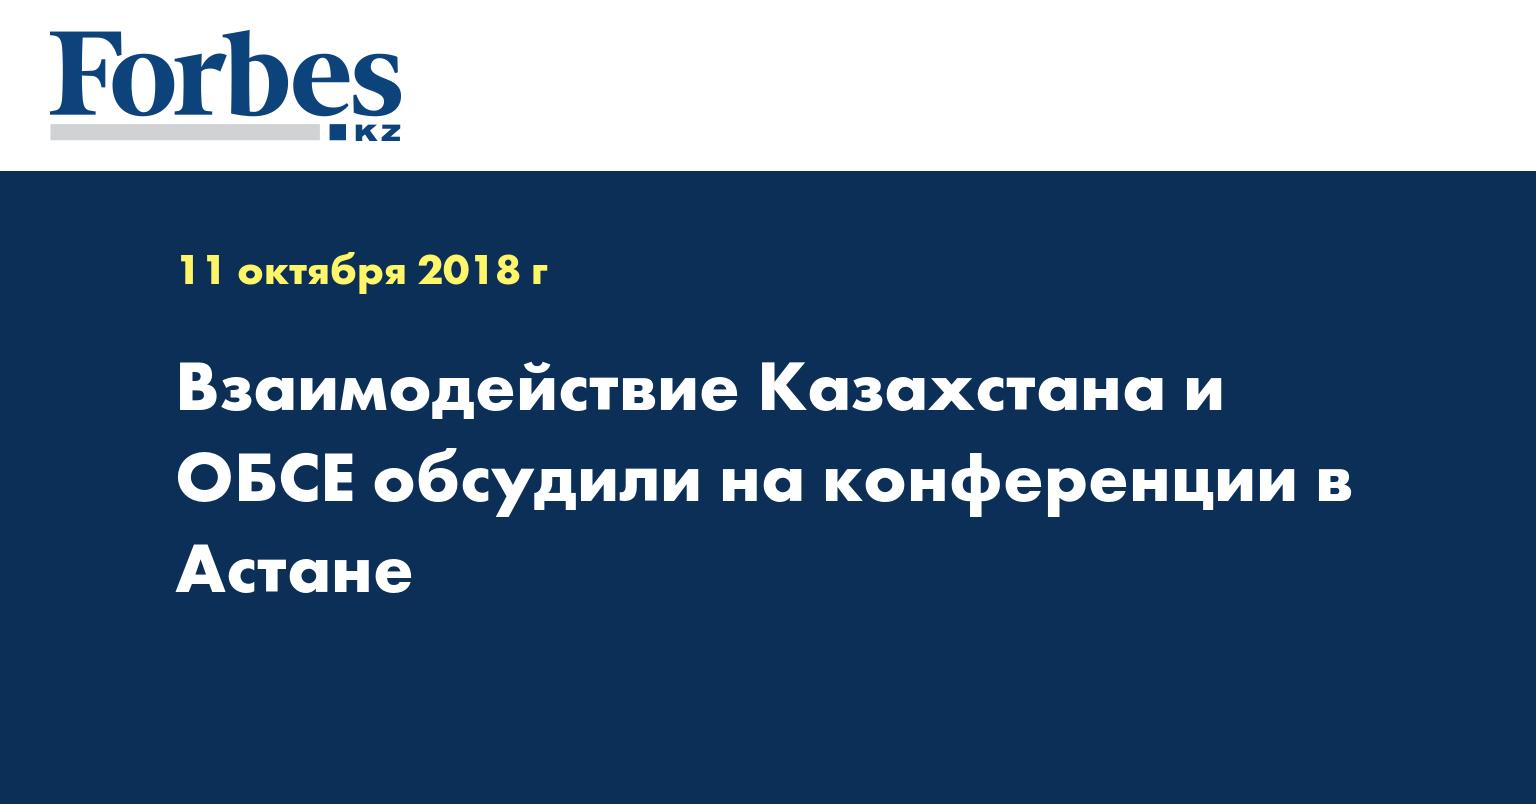 Взаимодействие Казахстана и ОБСЕ обсудили на конференции в Астане